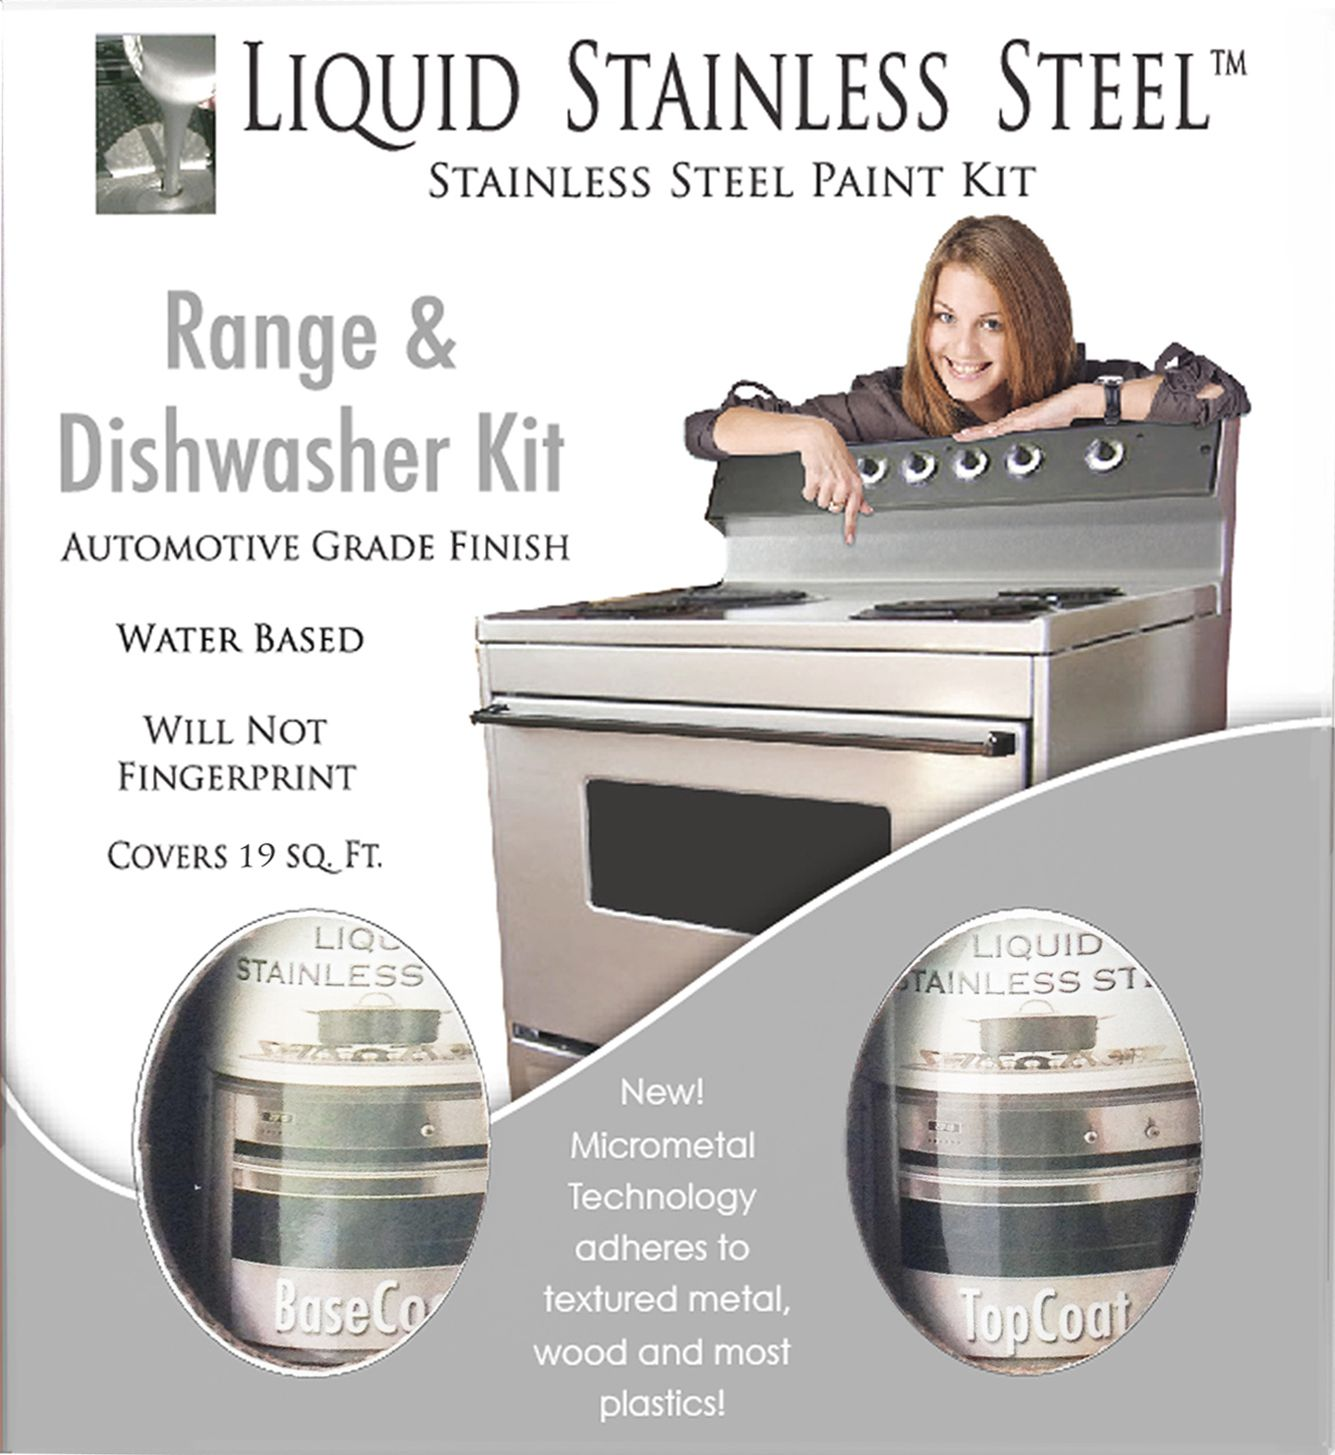 Liquid Stainless Steel Appliance Paint